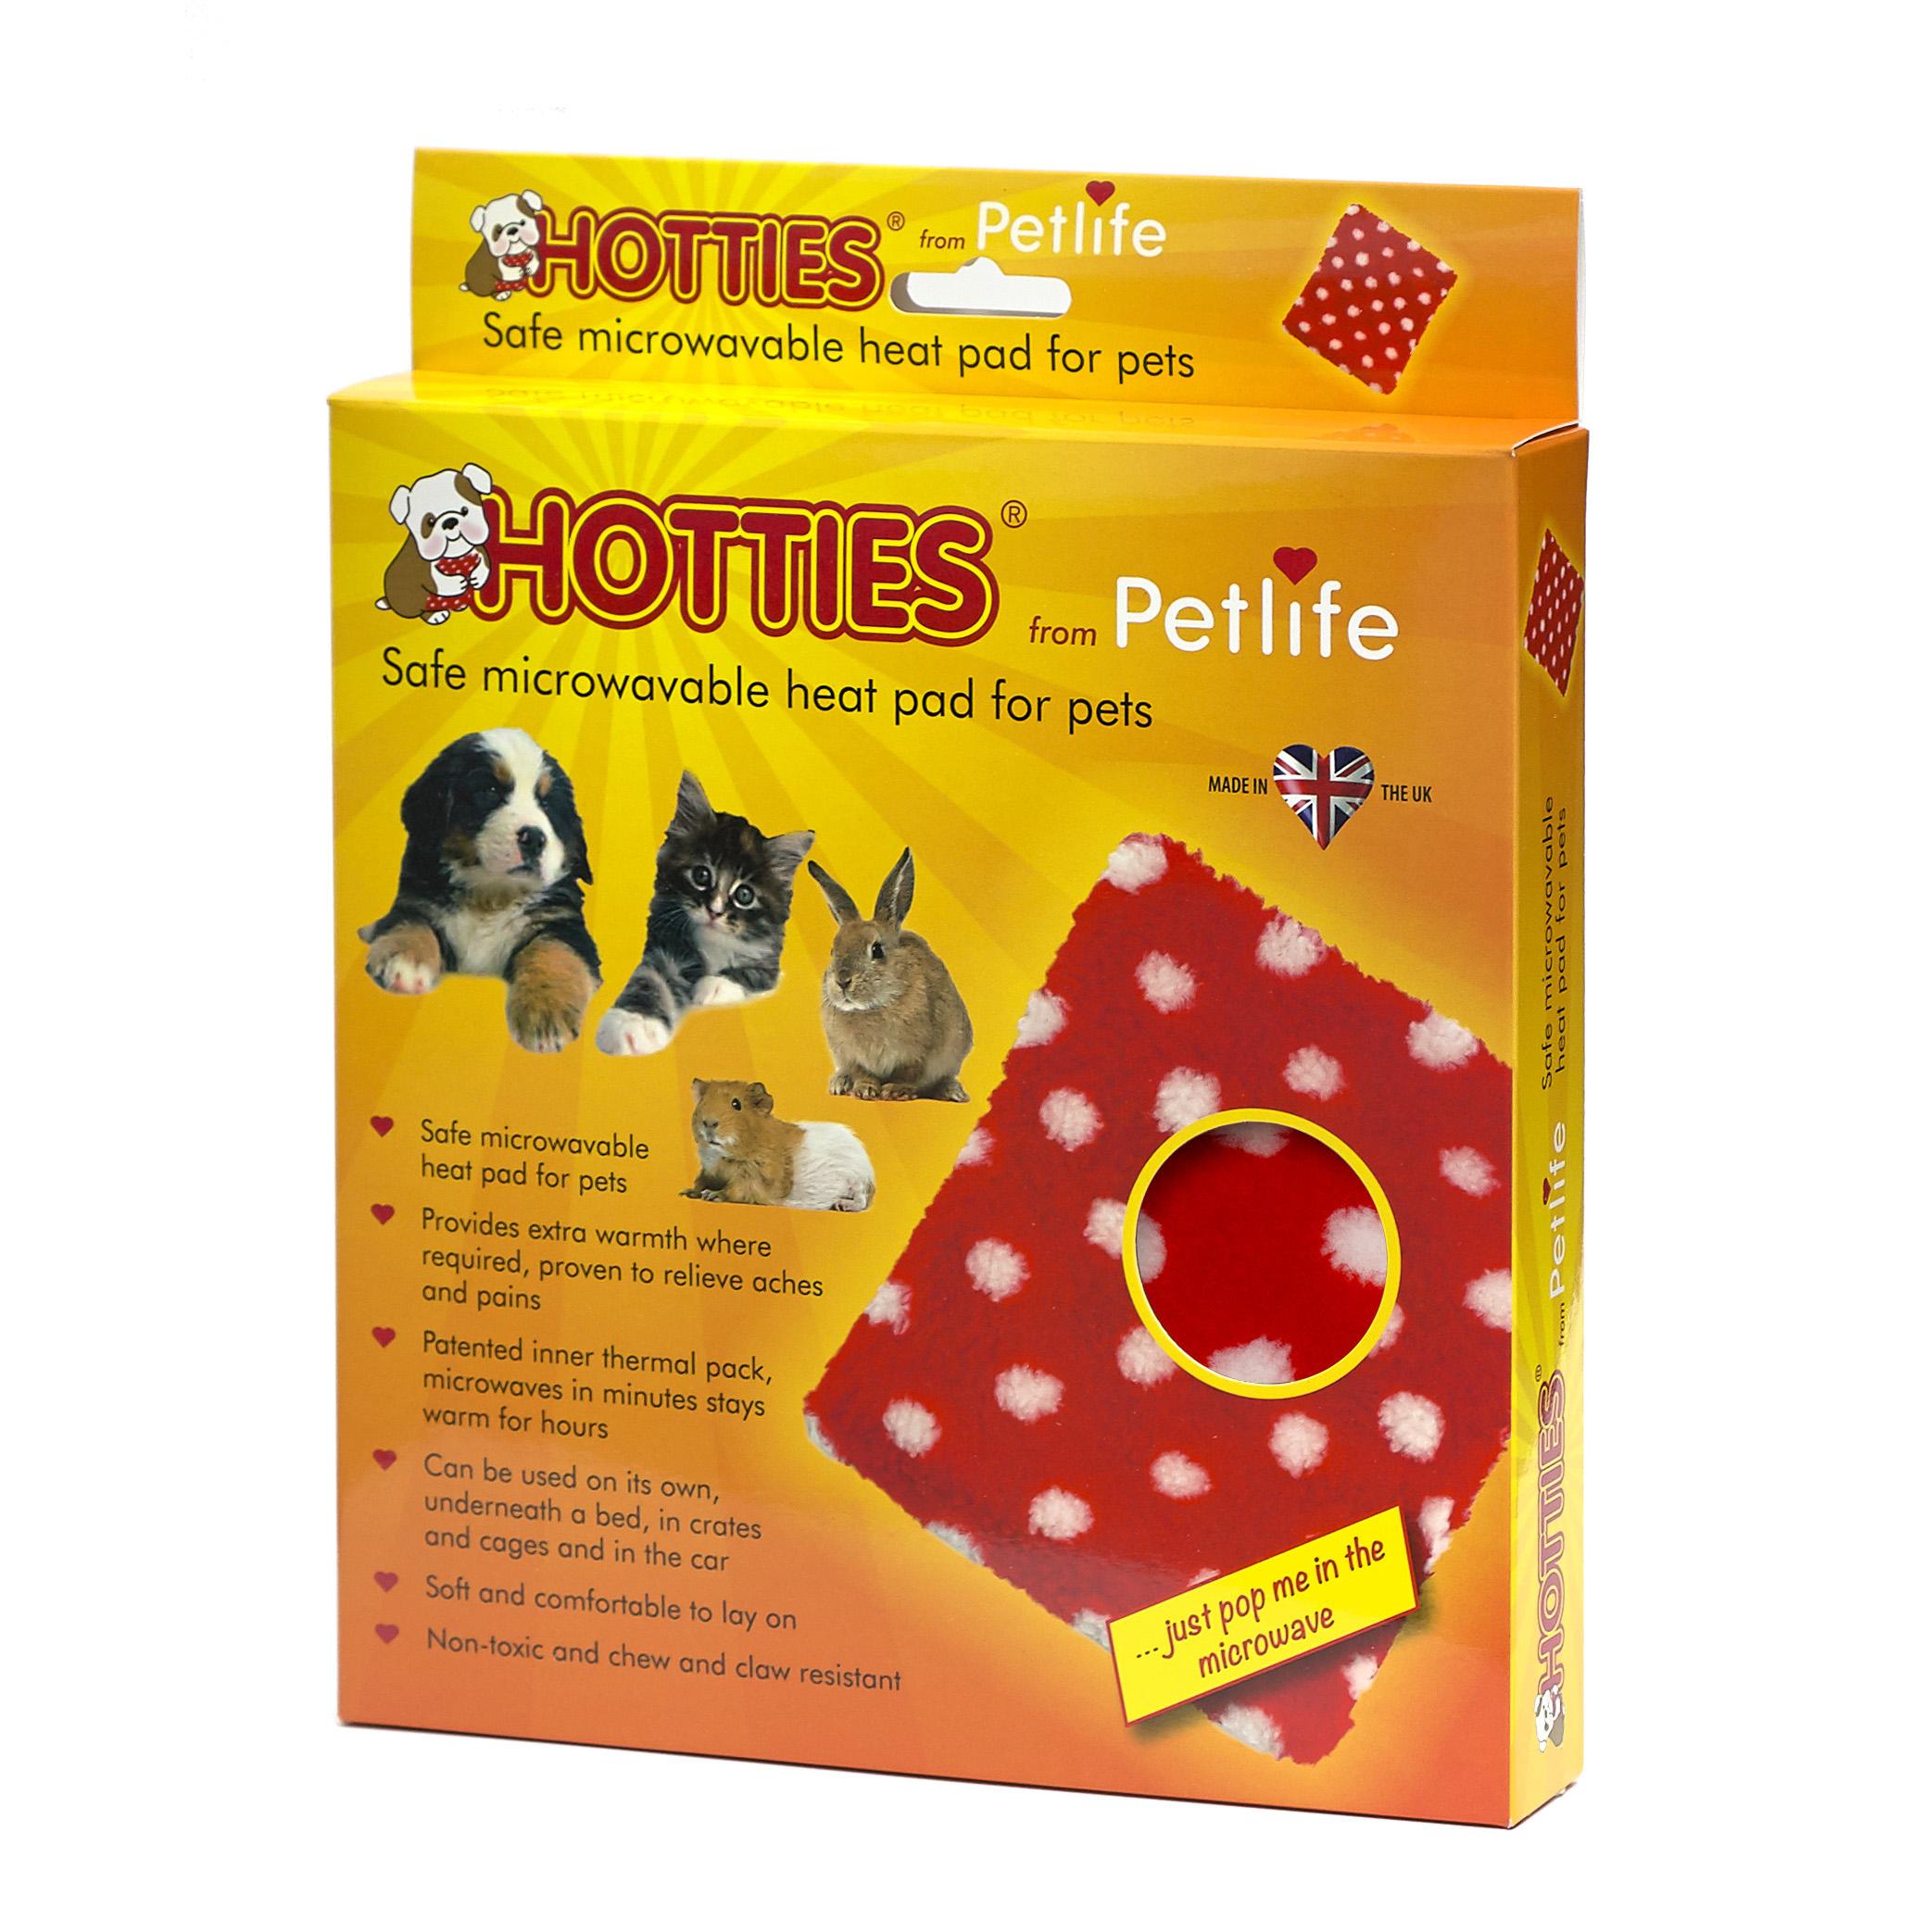 Petlife Hotties with Red Polka Dot Fleece Cover